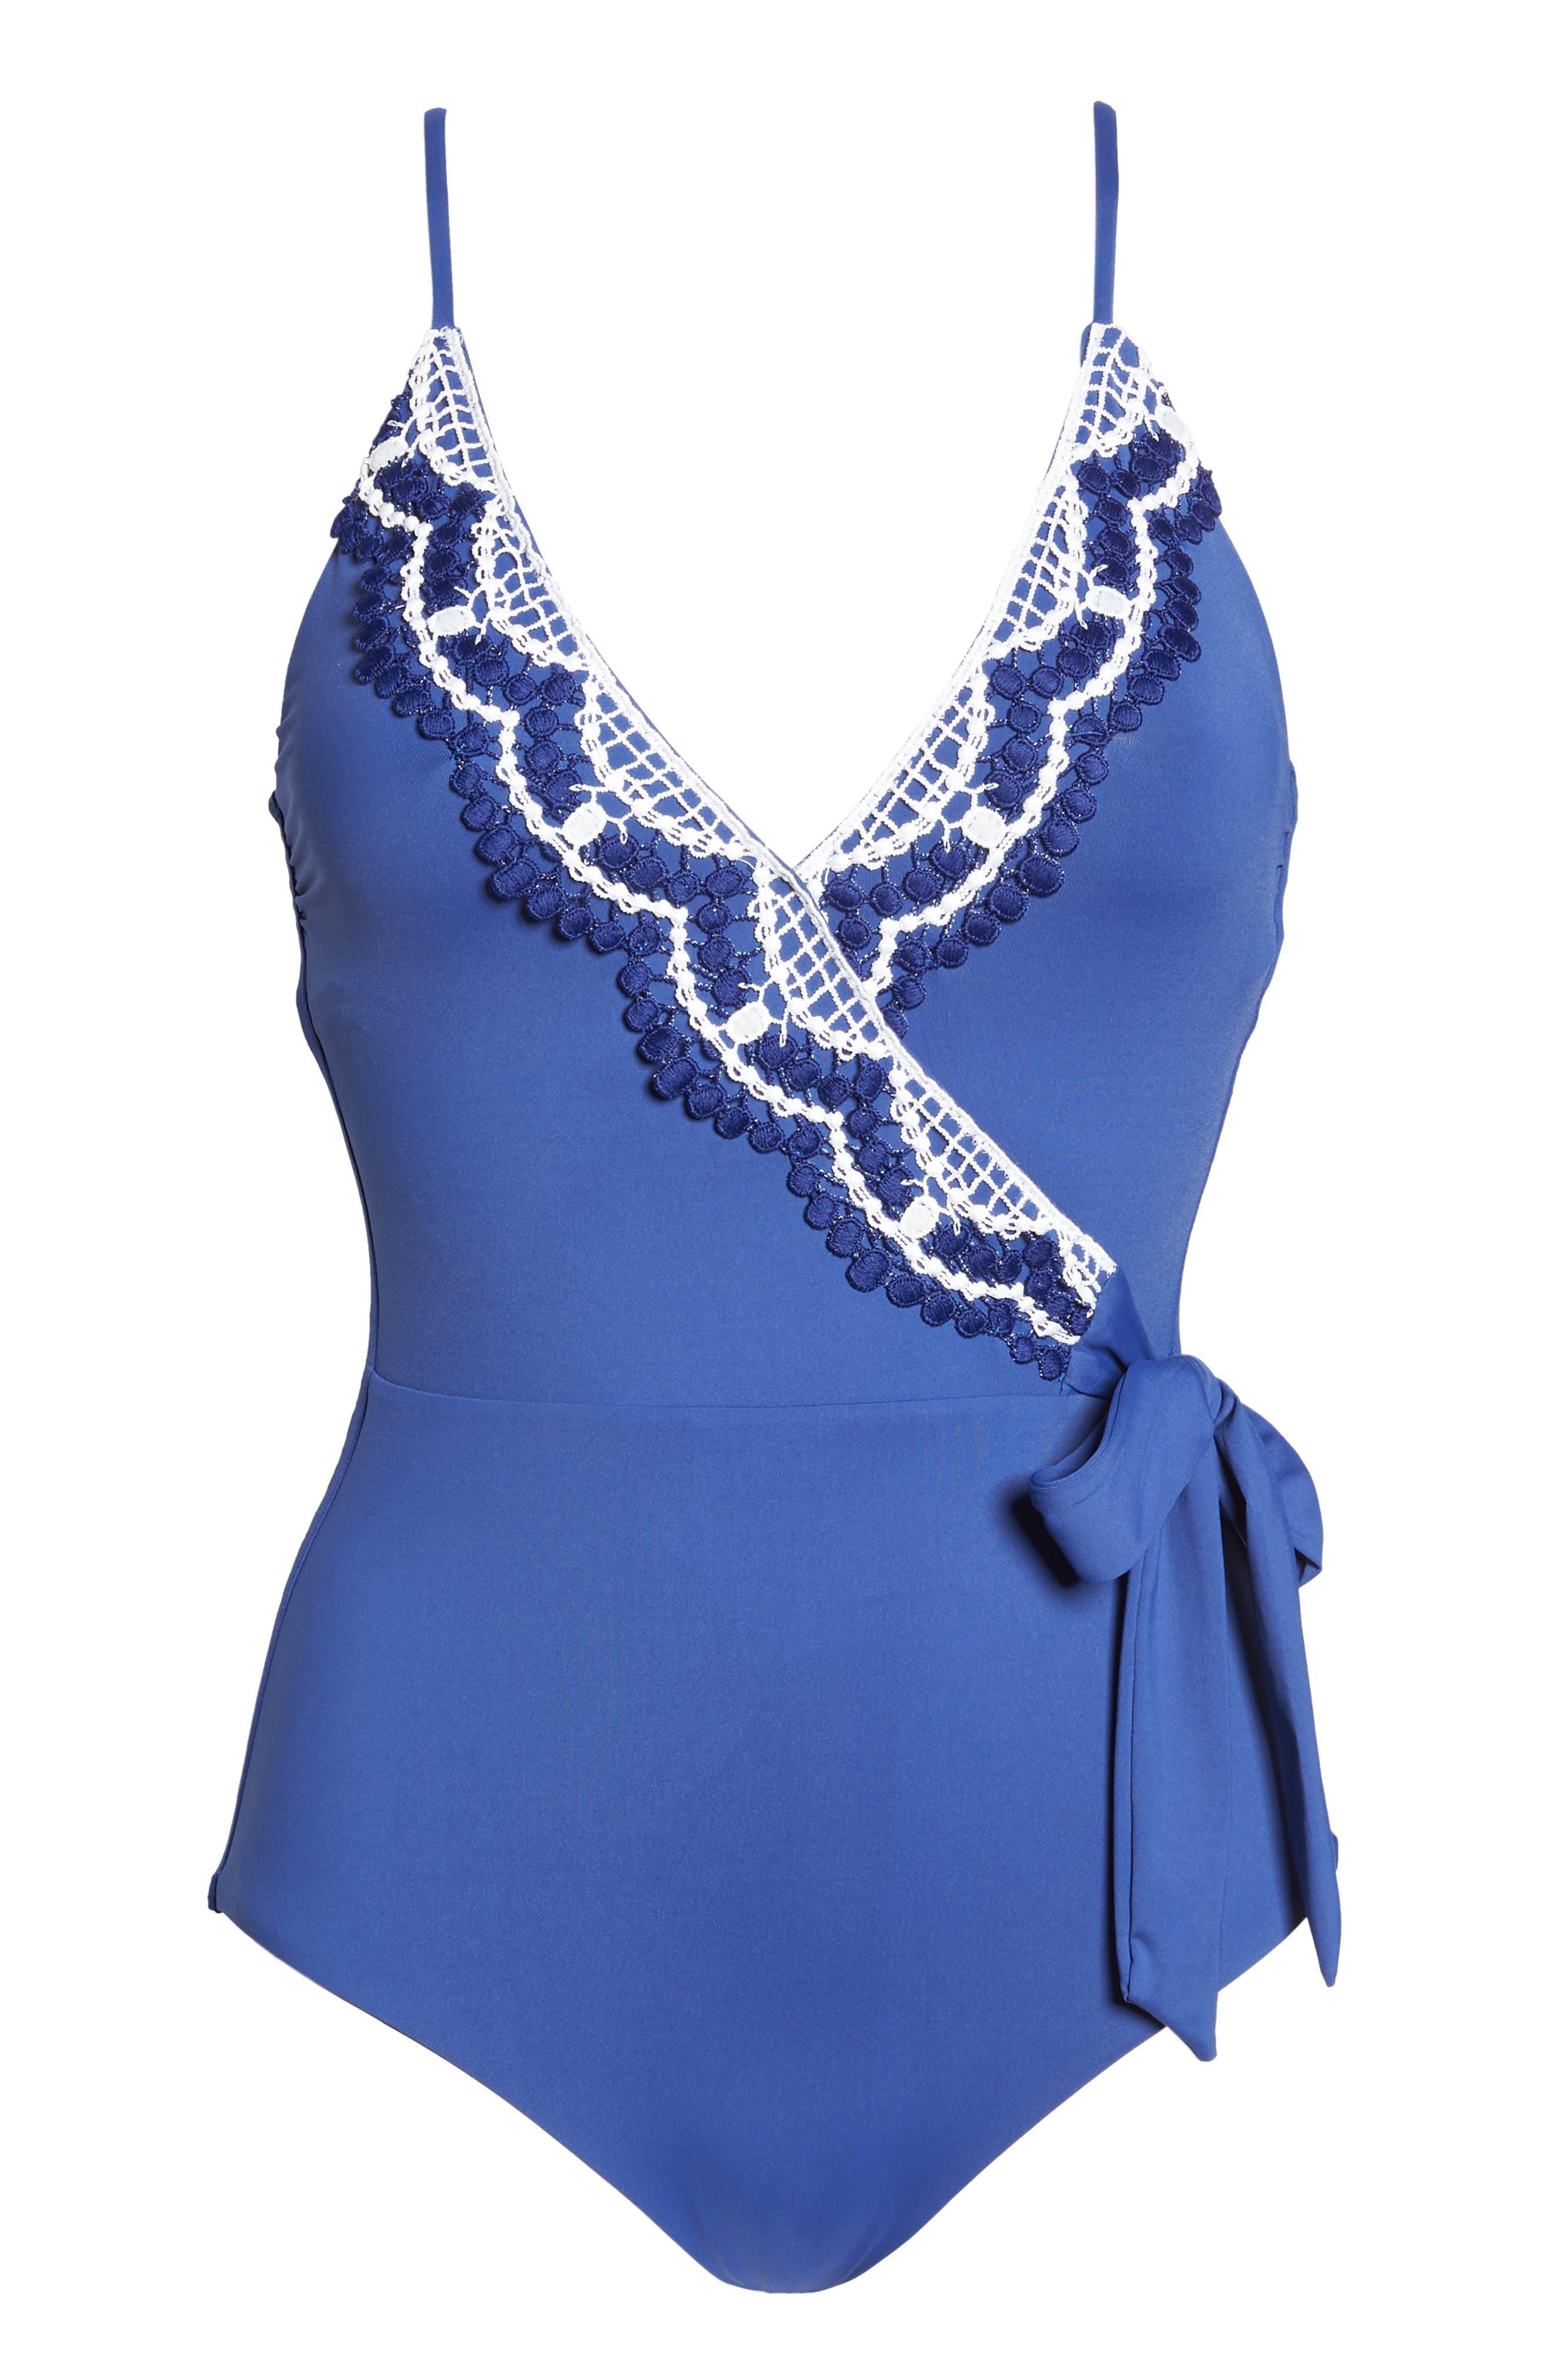 BECCA, Delilah One-Piece Swimsuit, Alternate thumbnail 7, color, BLUE TOPAZ